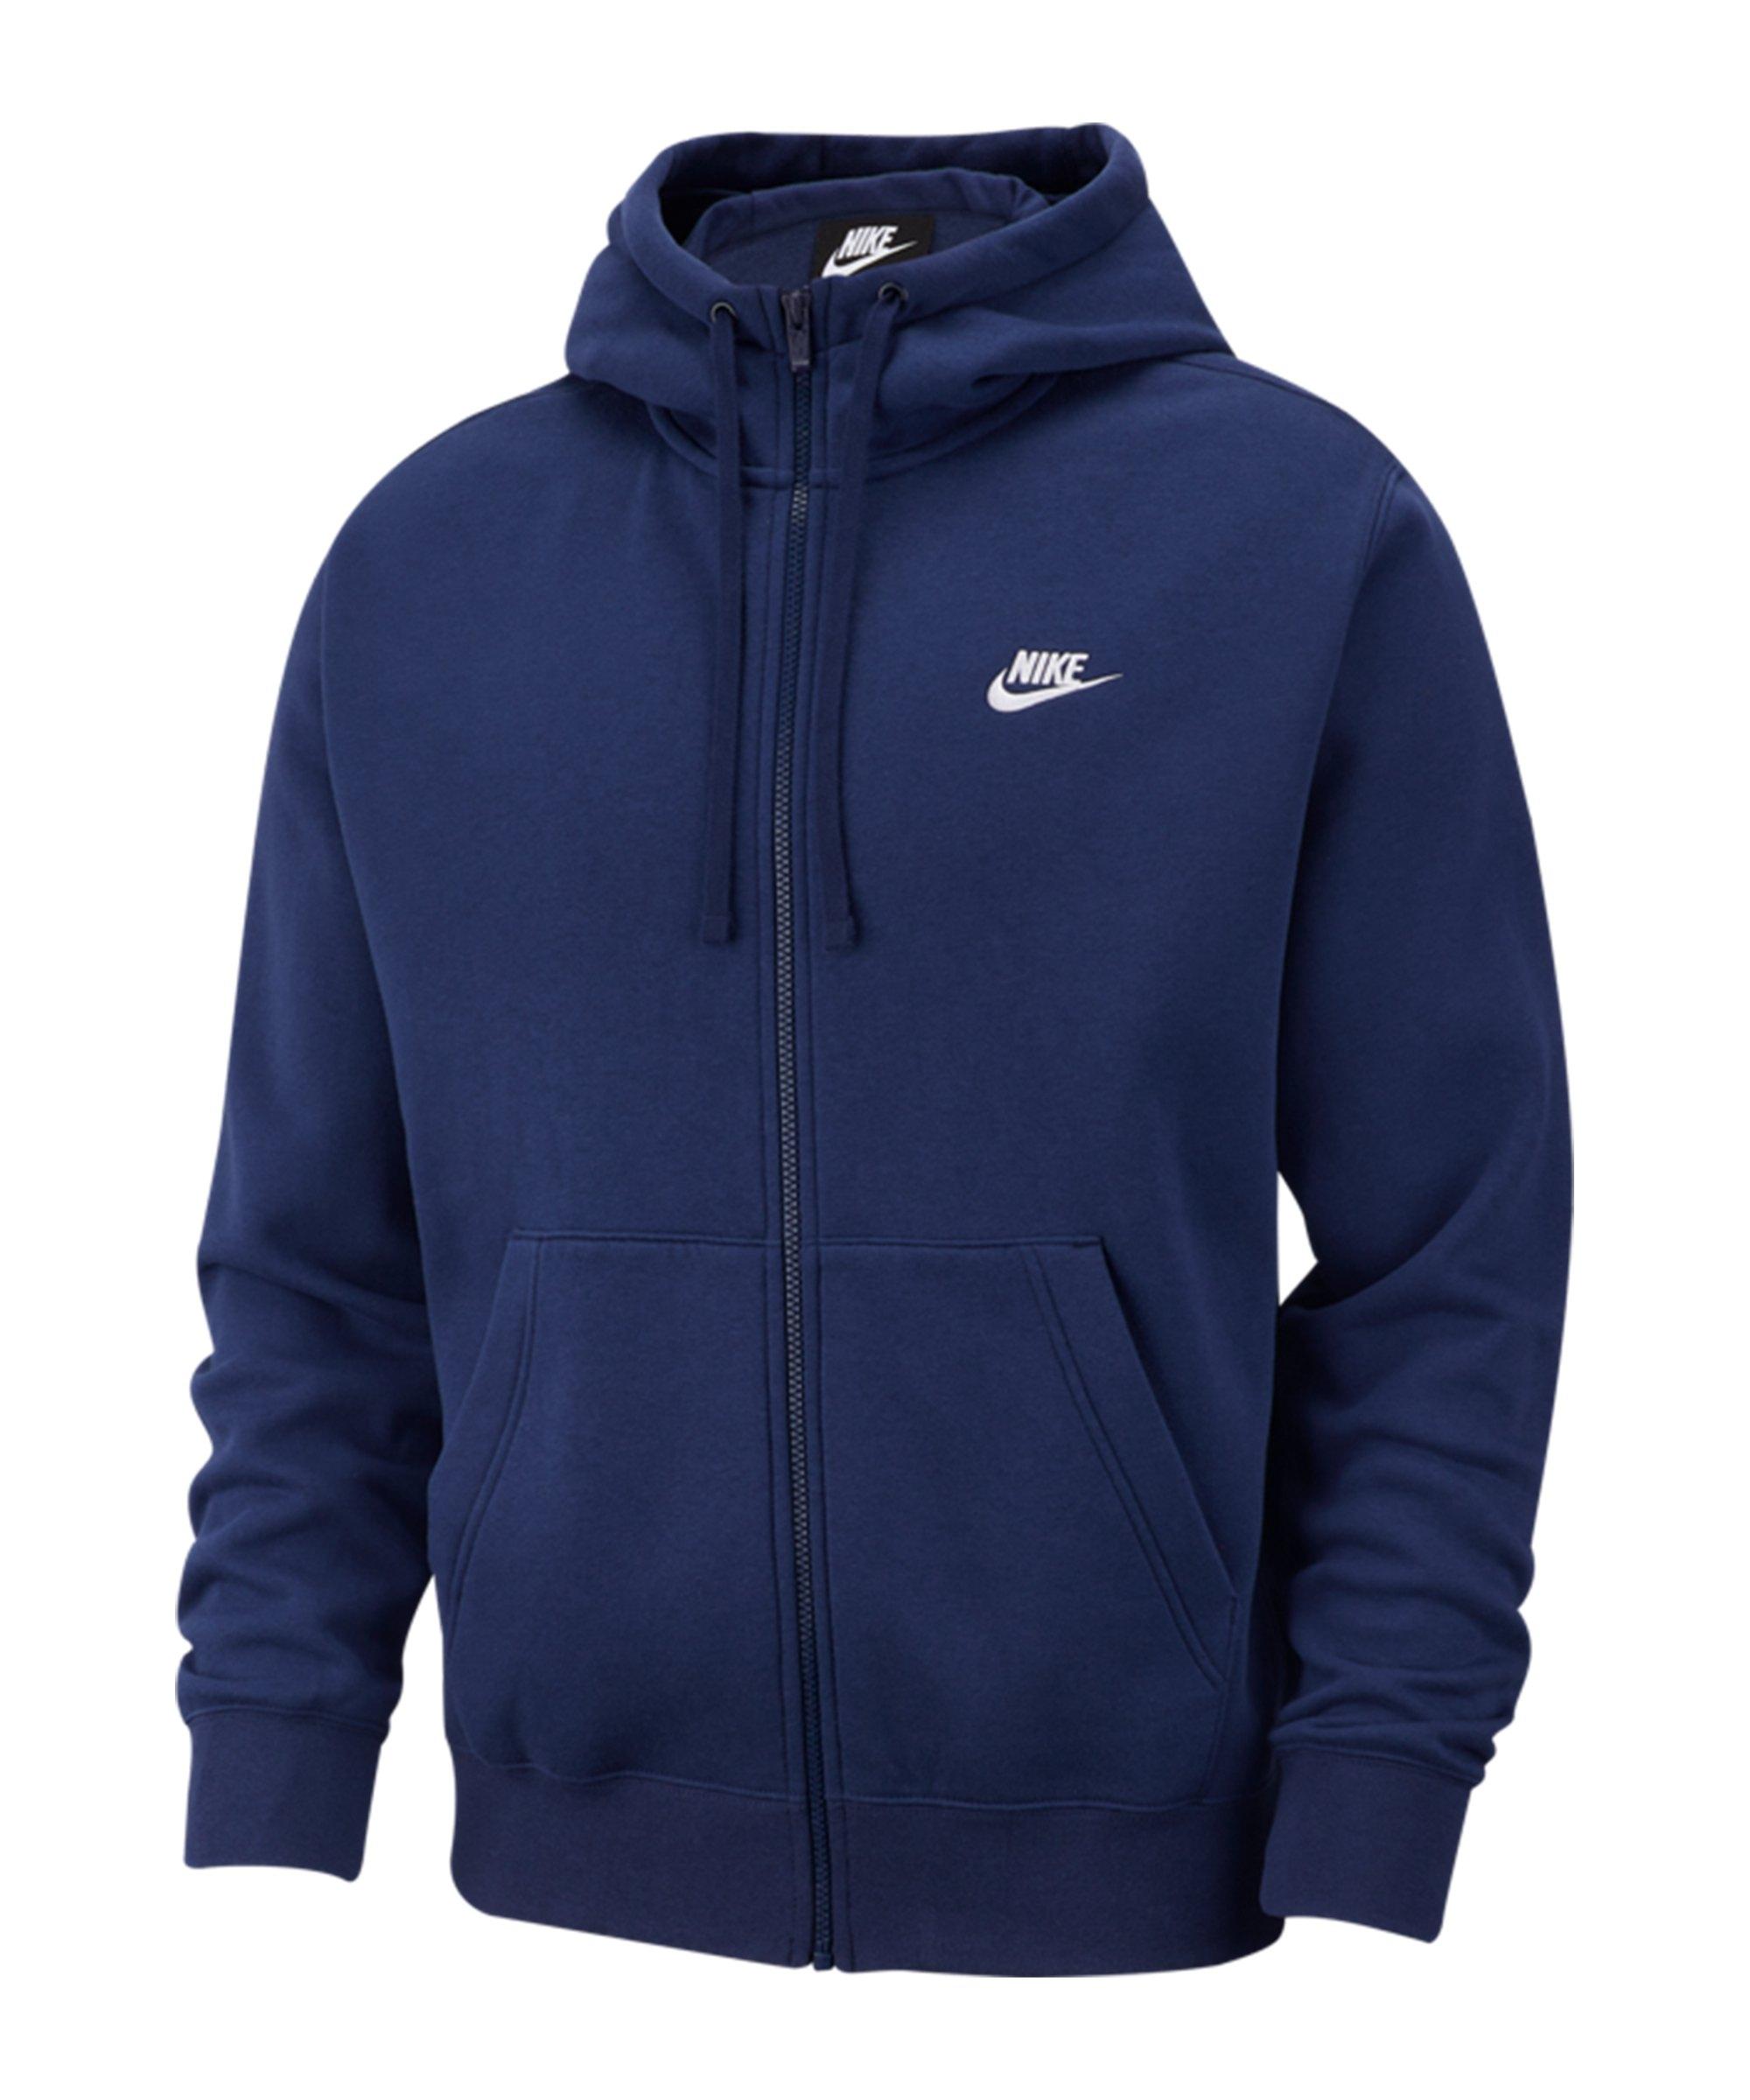 Nike Club Fleece Kapuzenjacke Blau F410 - blau